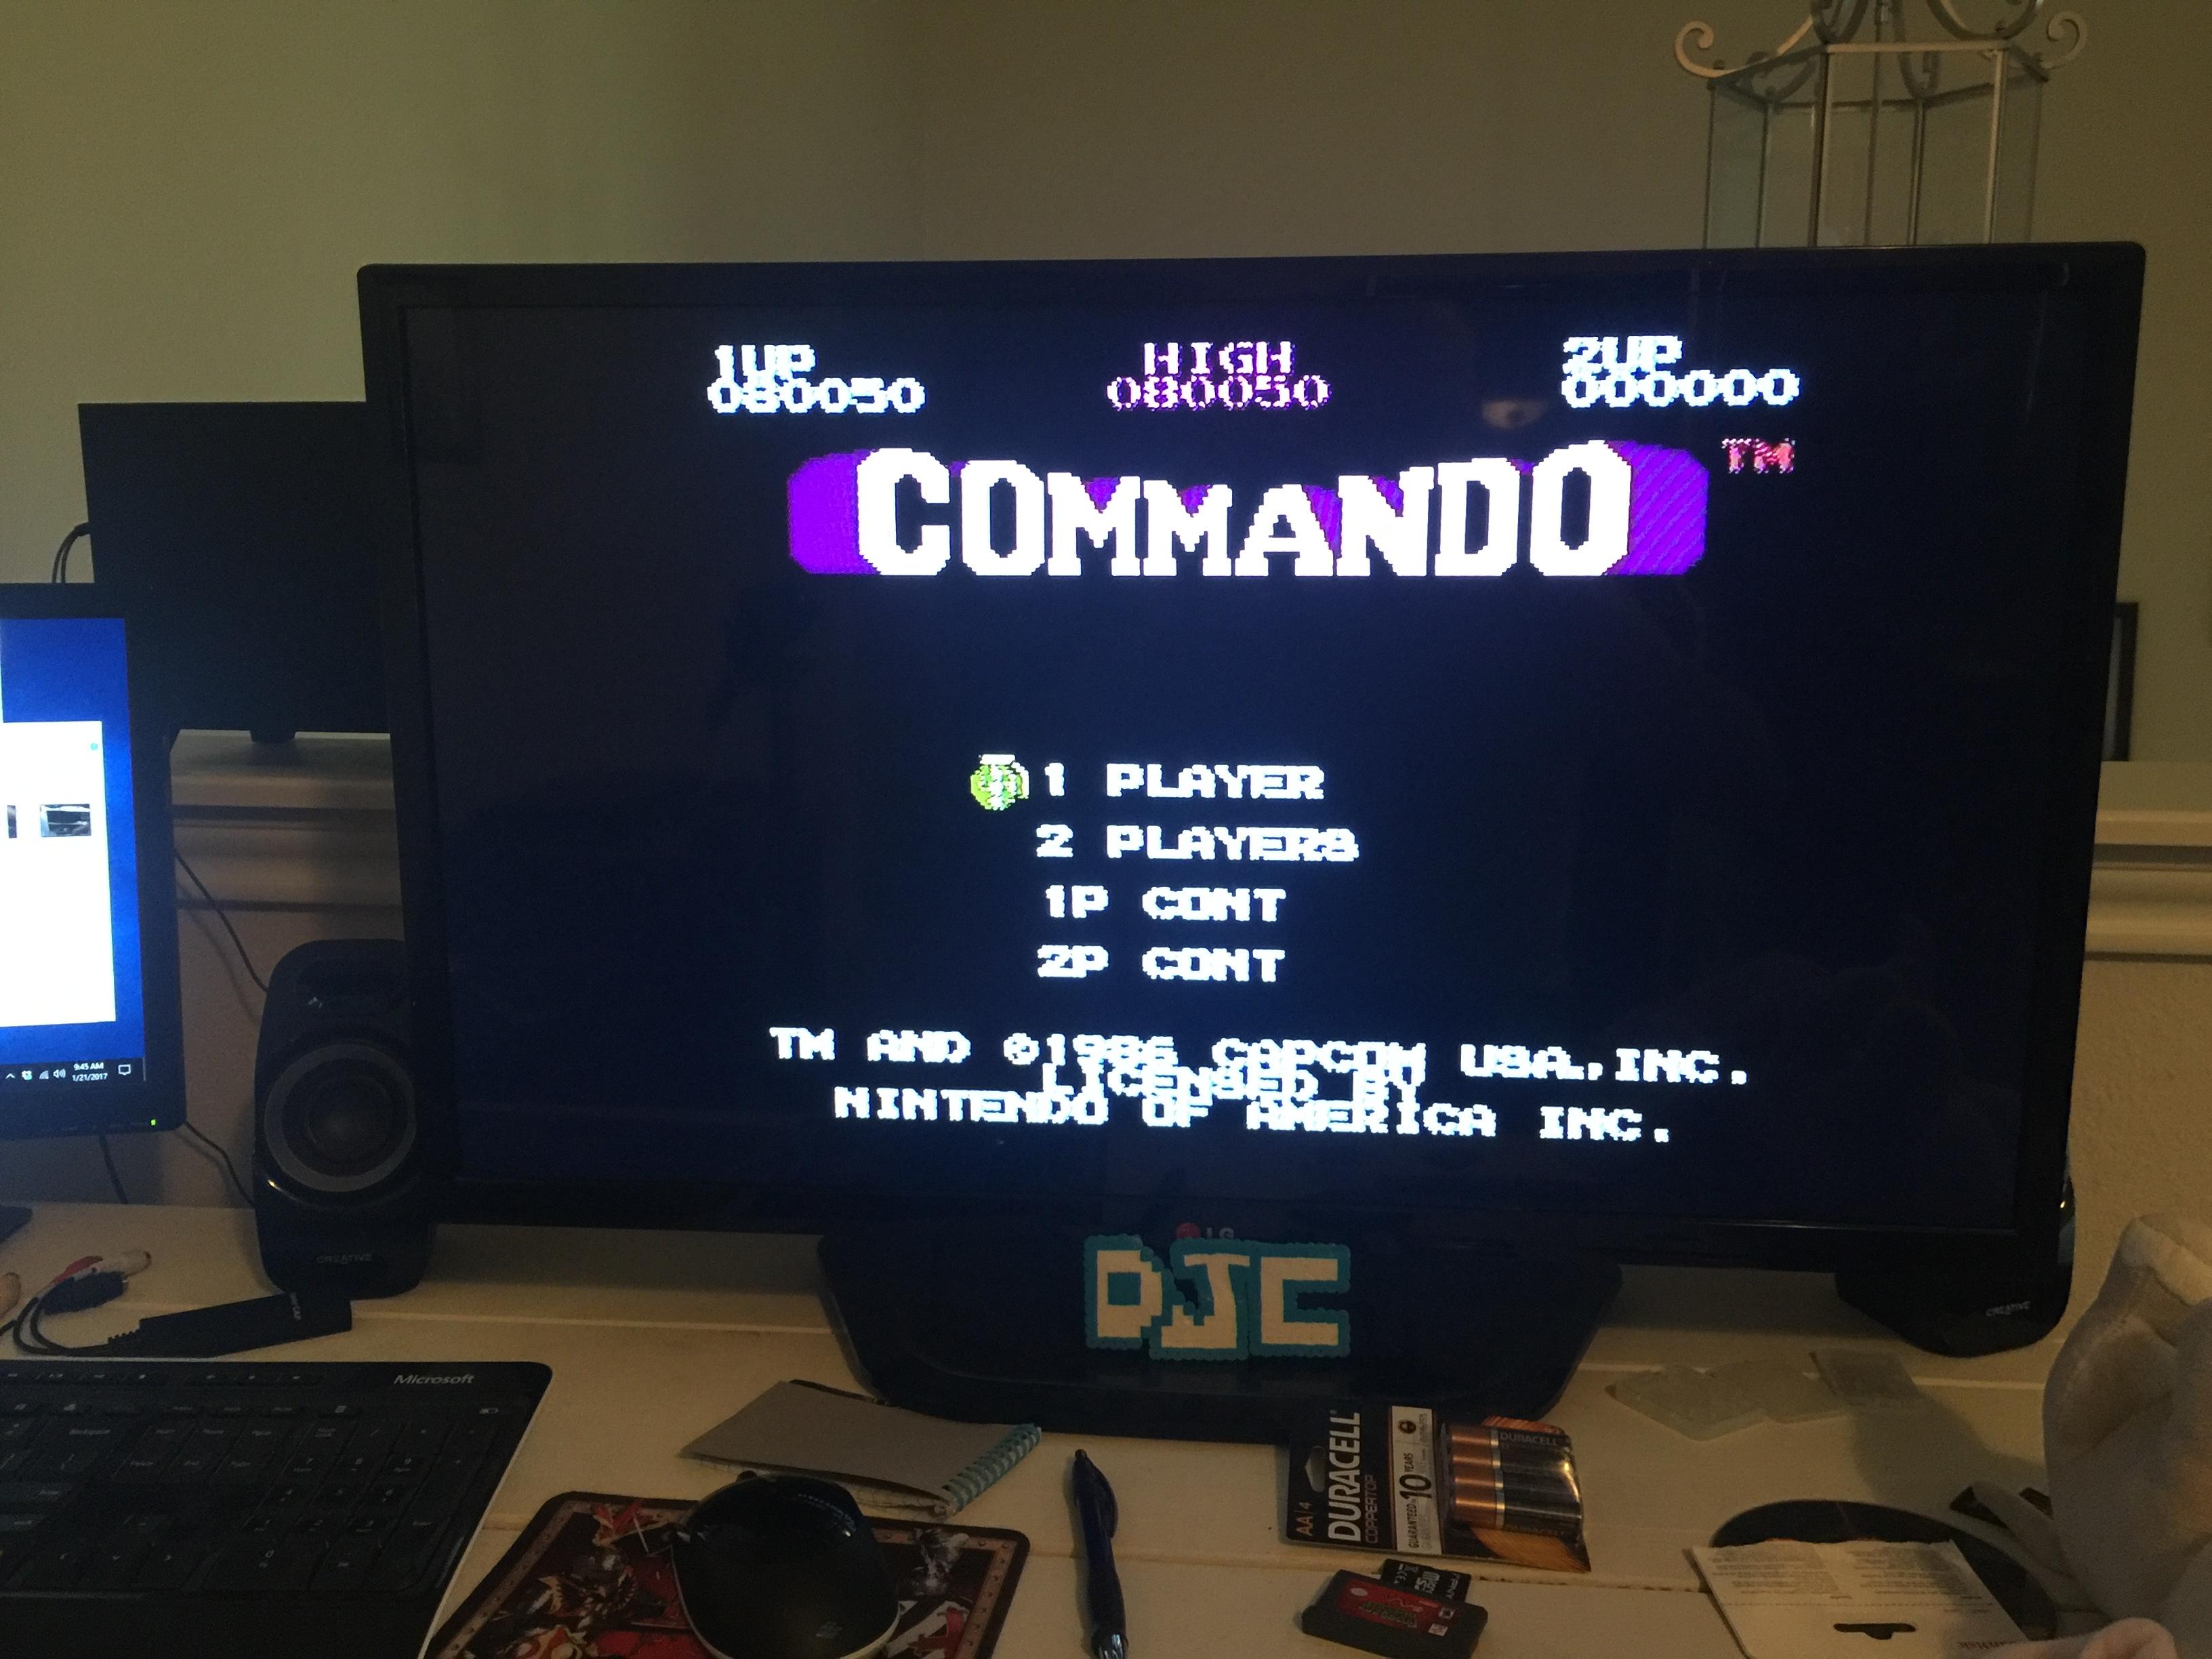 derek: Commando (NES/Famicom) 80,050 points on 2017-01-21 10:06:43